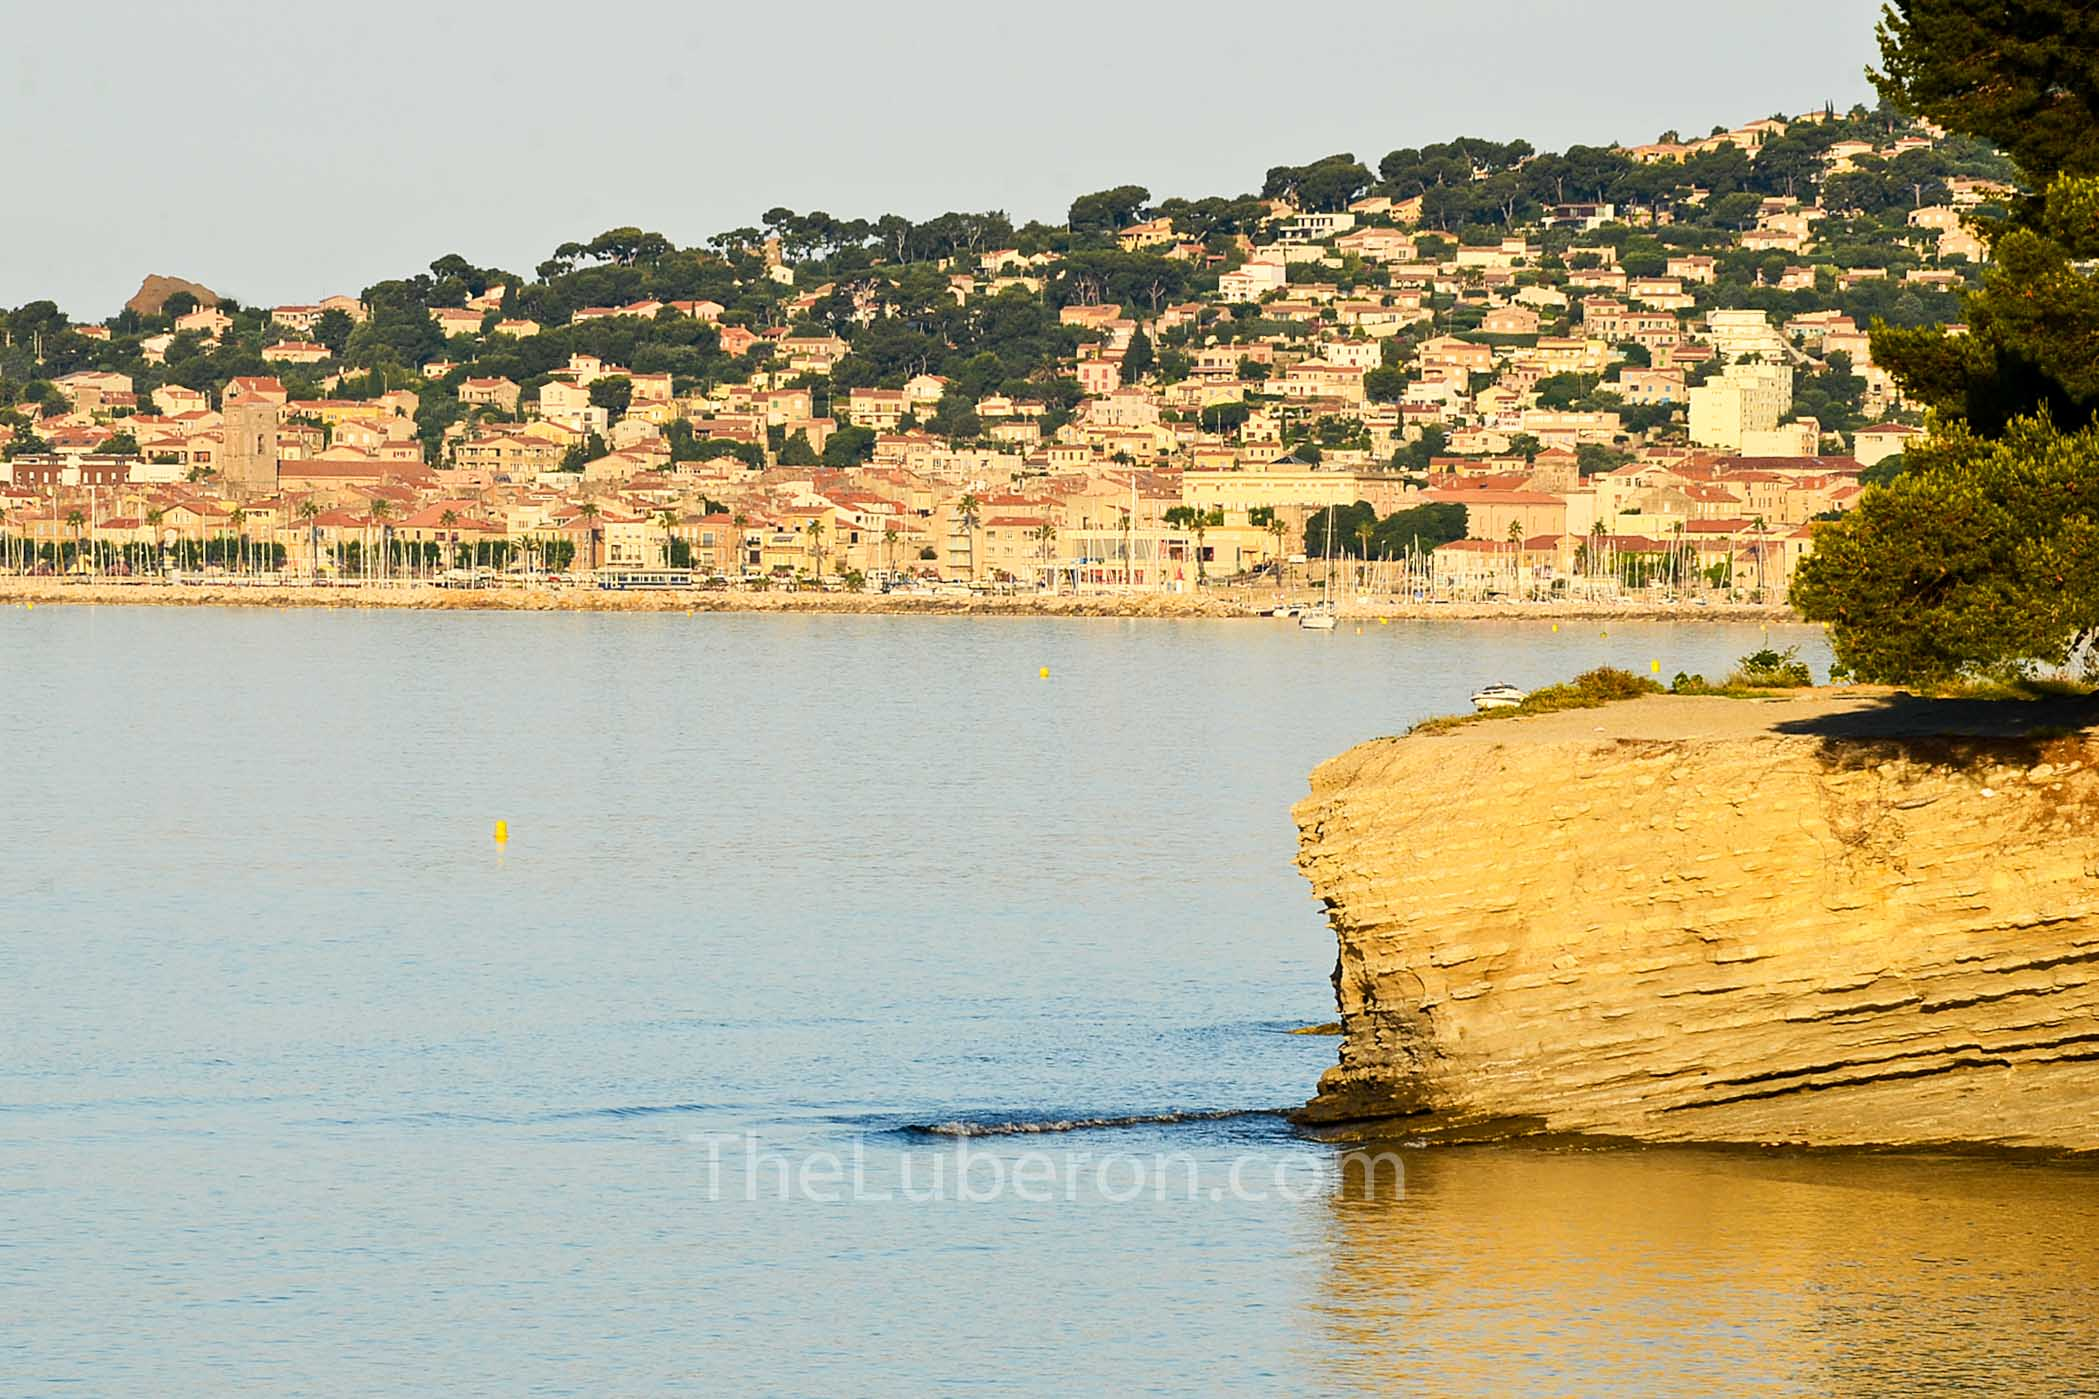 La Ciotat from across the bay